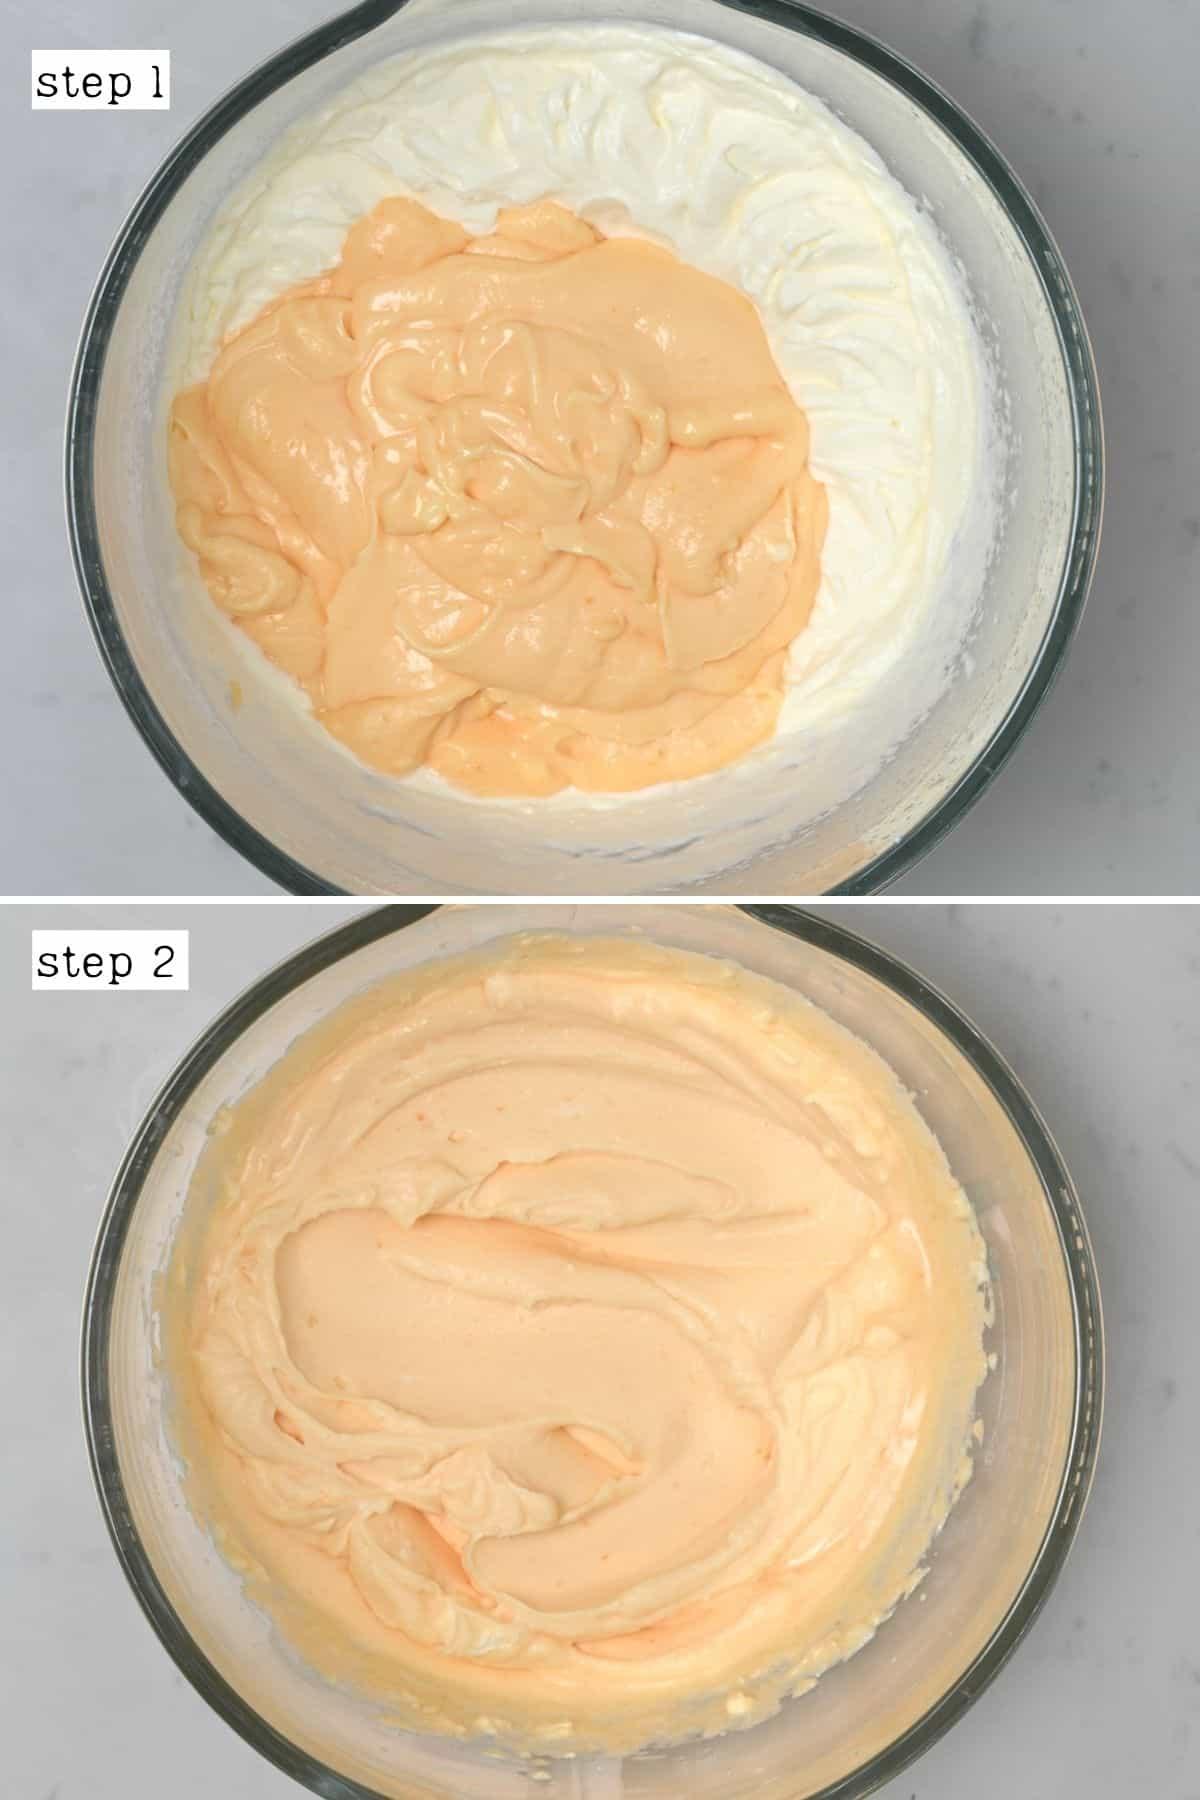 Steps for mixing Tiramisu filling